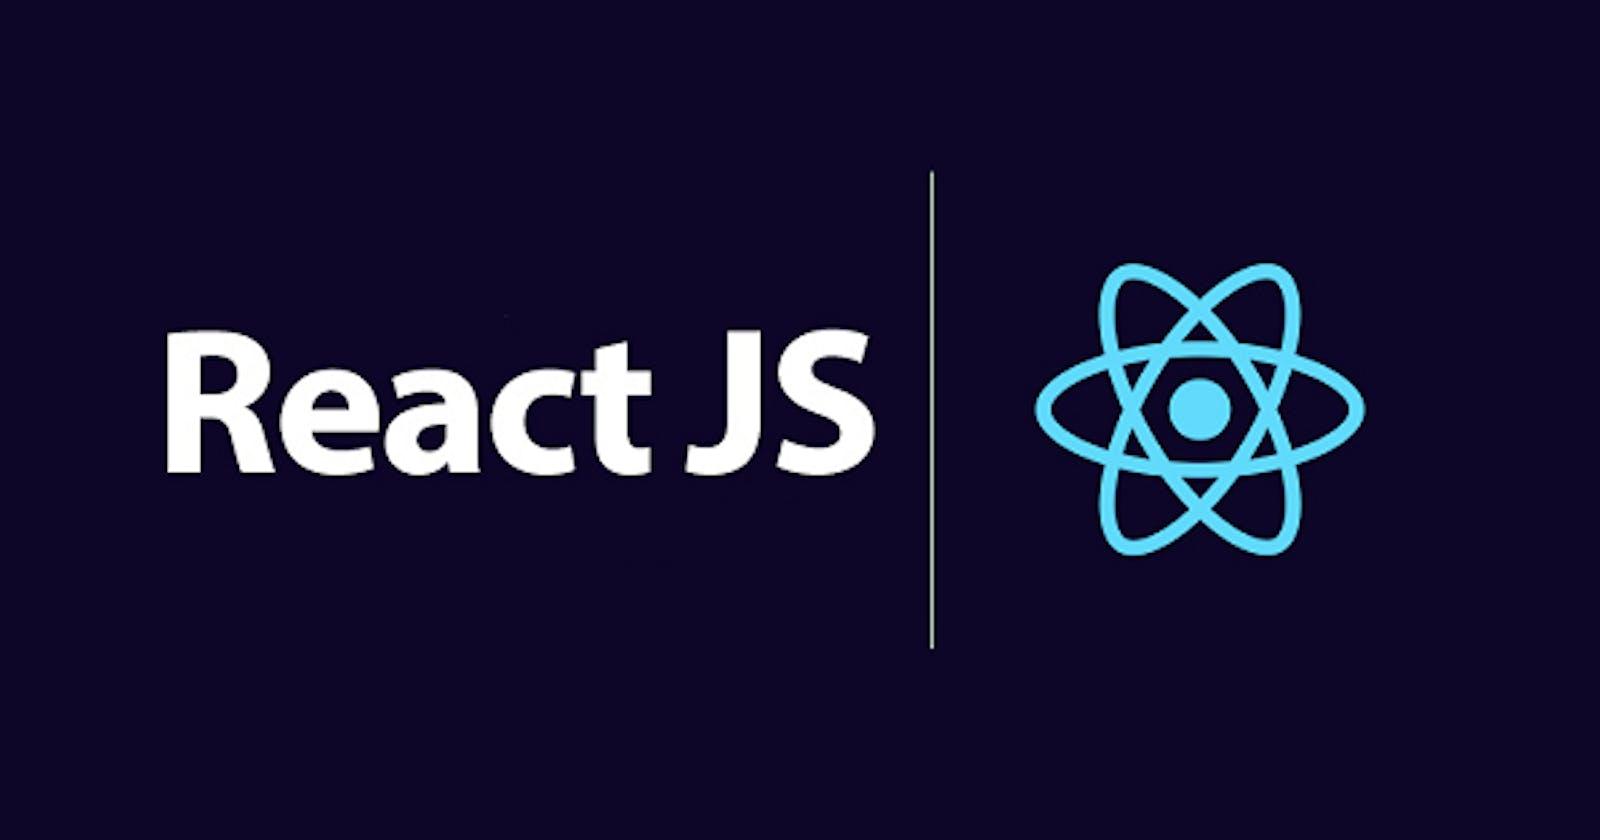 Part 1: Build Button clicker in React.js